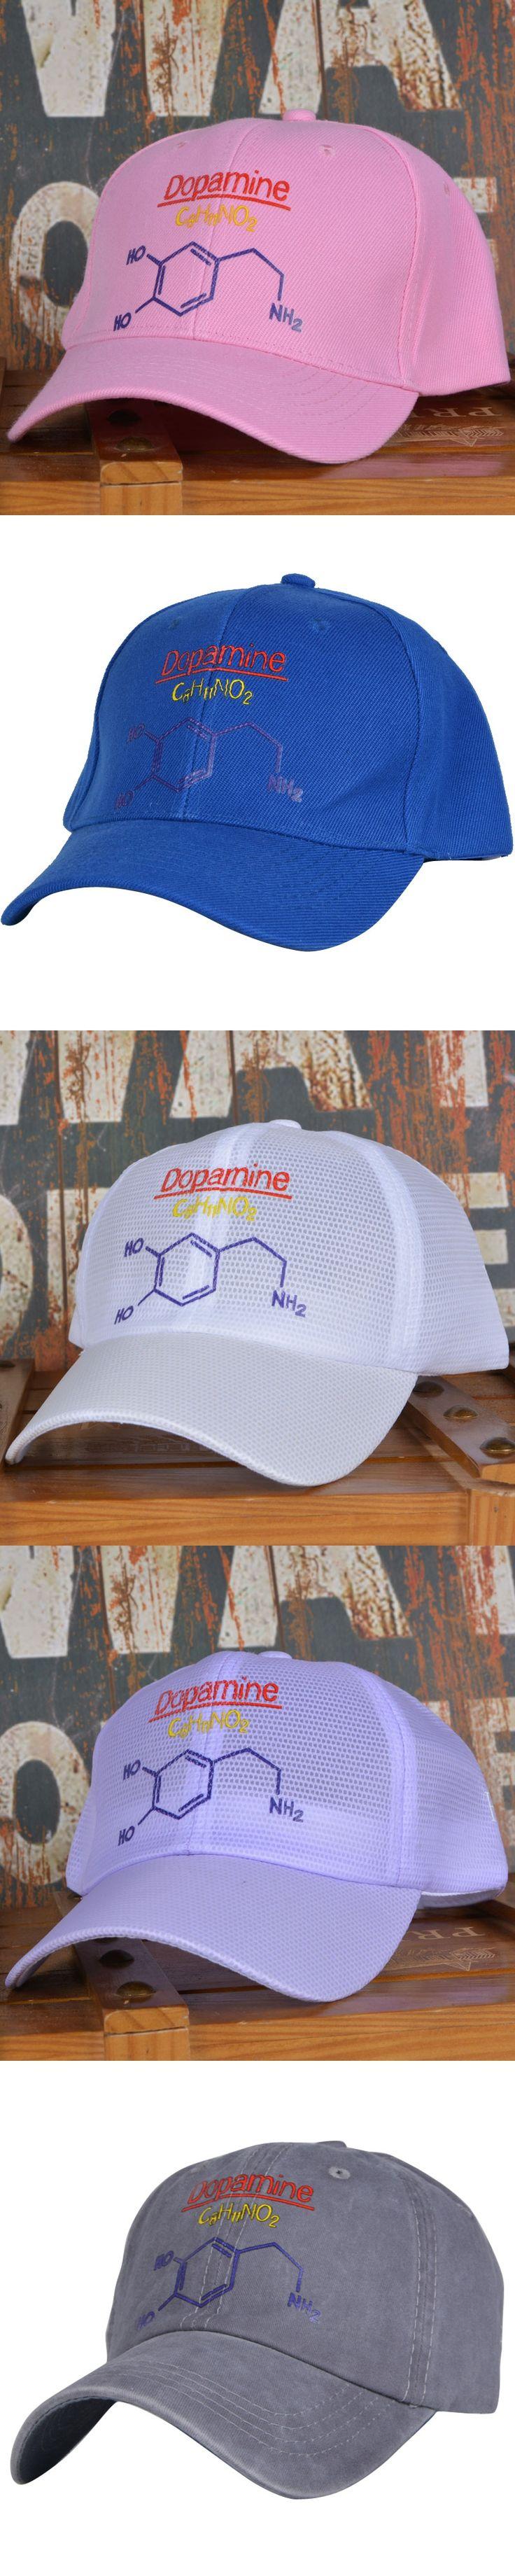 dopamine Casquette caps  Man Woman's sunshade hat Hip-hop cap student college style girls boys Ventilation cotton baseball cap